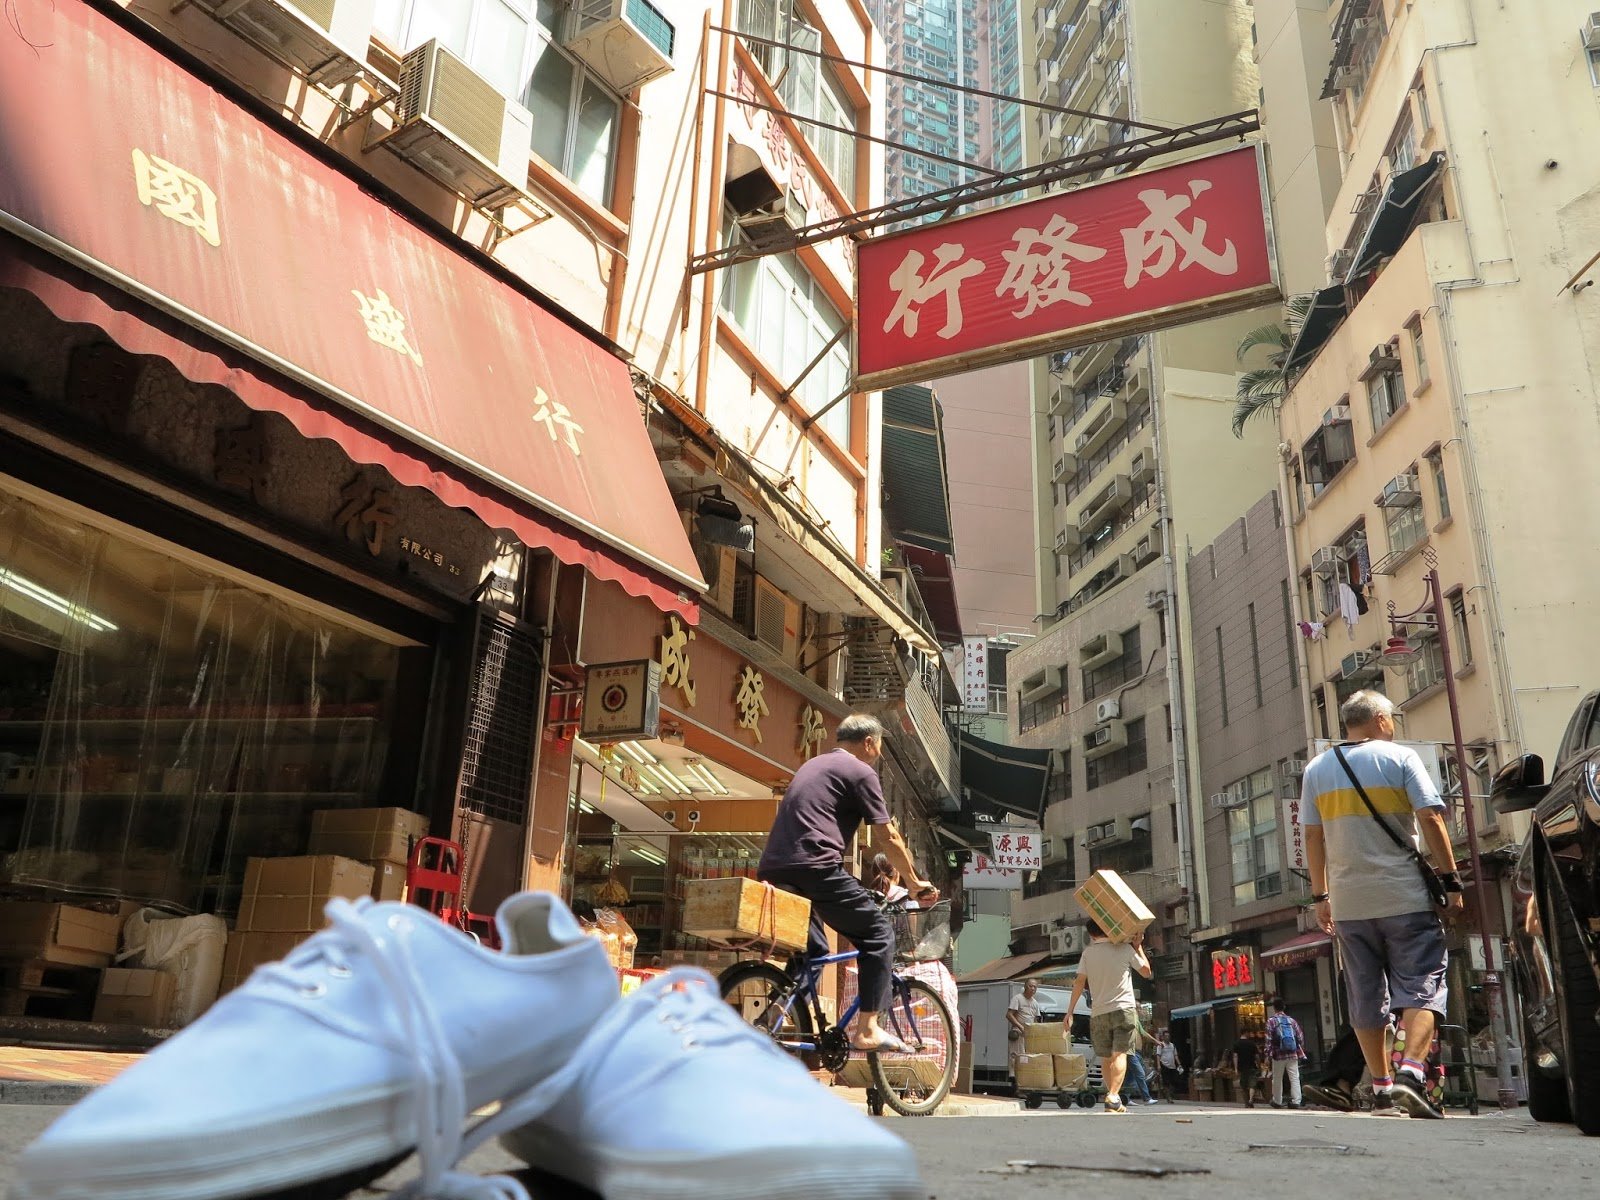 SPD4459 The Little White Shoes - Across HK Central-Western District: SPD4459 The Little White Shoes 高陞街 (藥材街) Ko Shing Street (Chinese ...